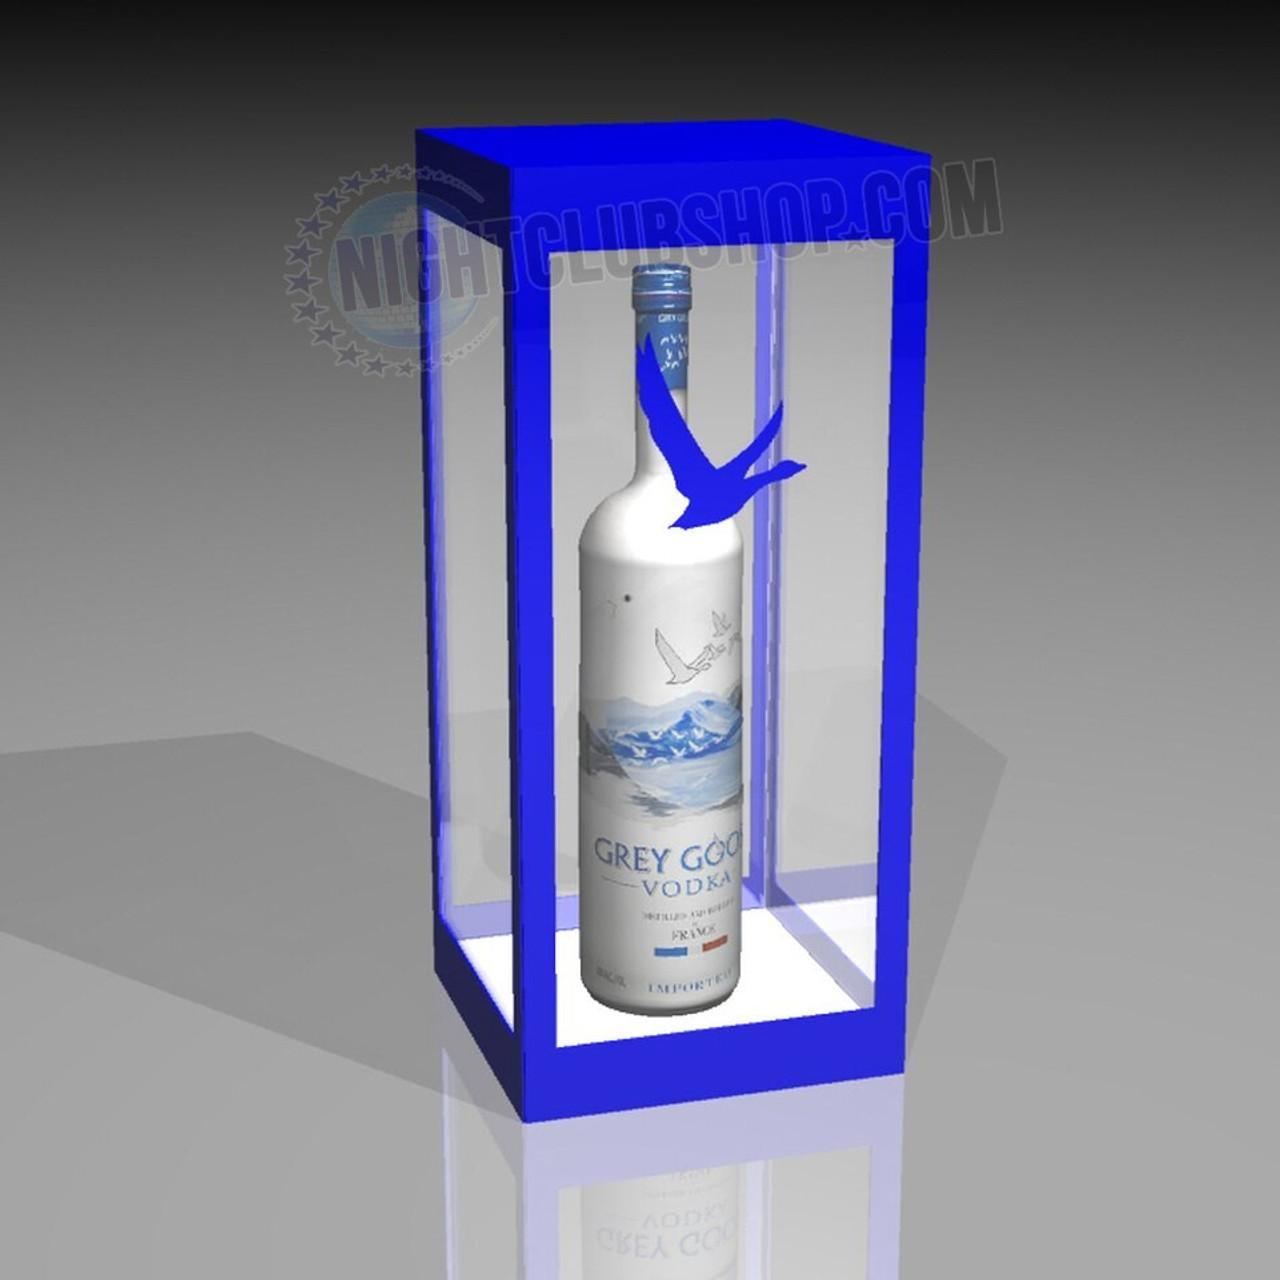 Liquor lock, Patrons, bottle lock, VIP, bottle service, LED, Cage, presenter, nightclub, bar, casino, table service, Spirits